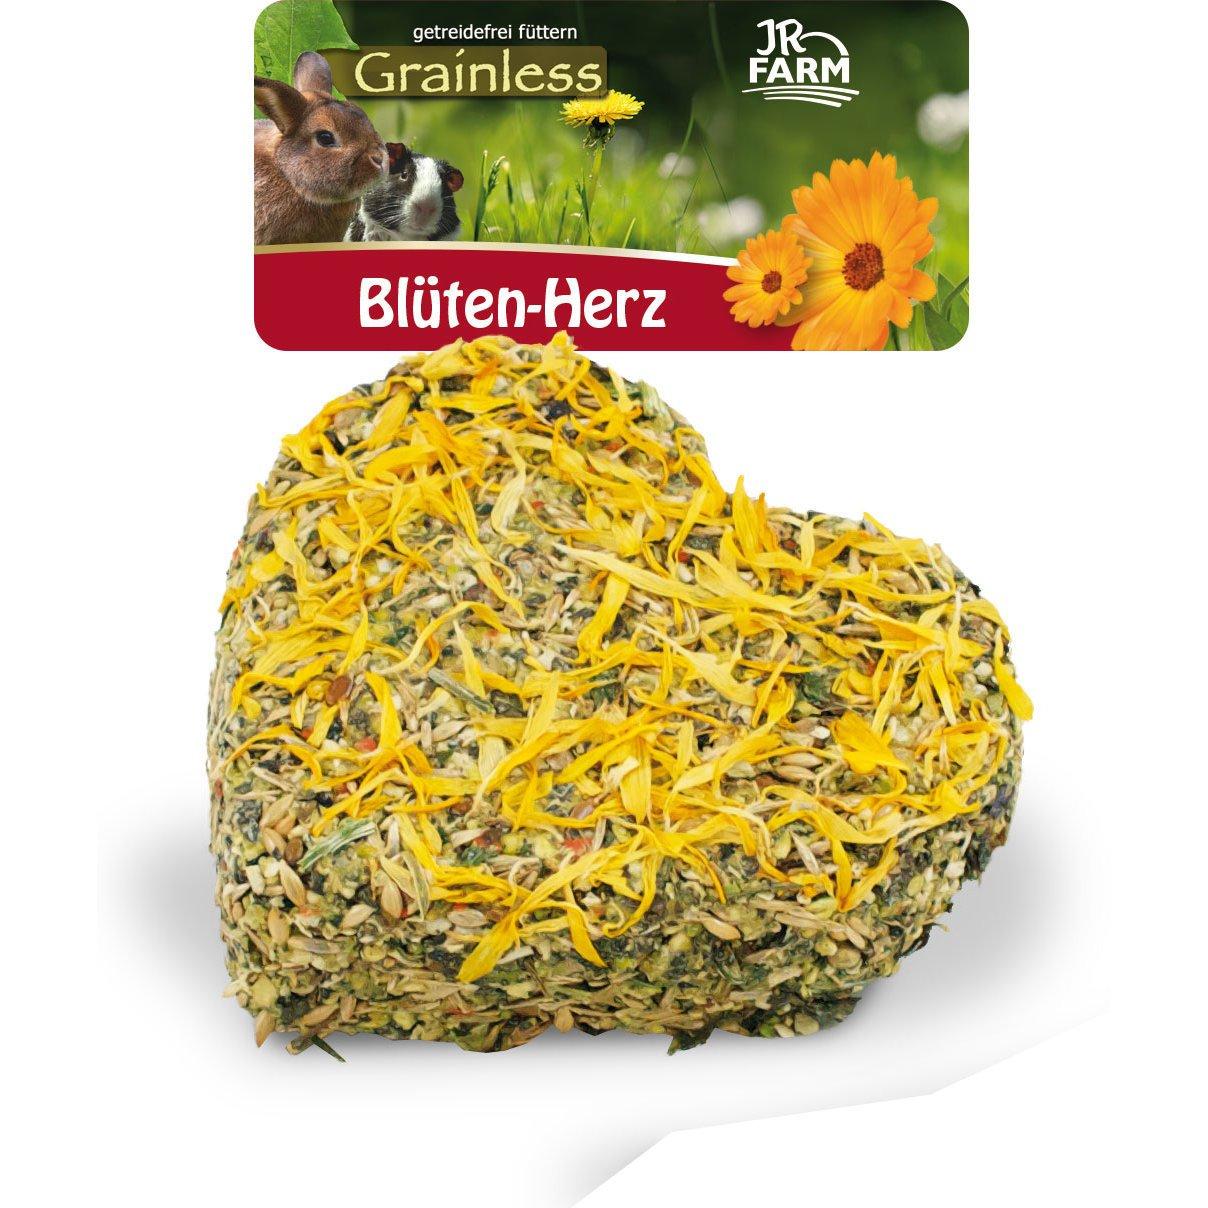 Grainless Blüten Herz Bild 1